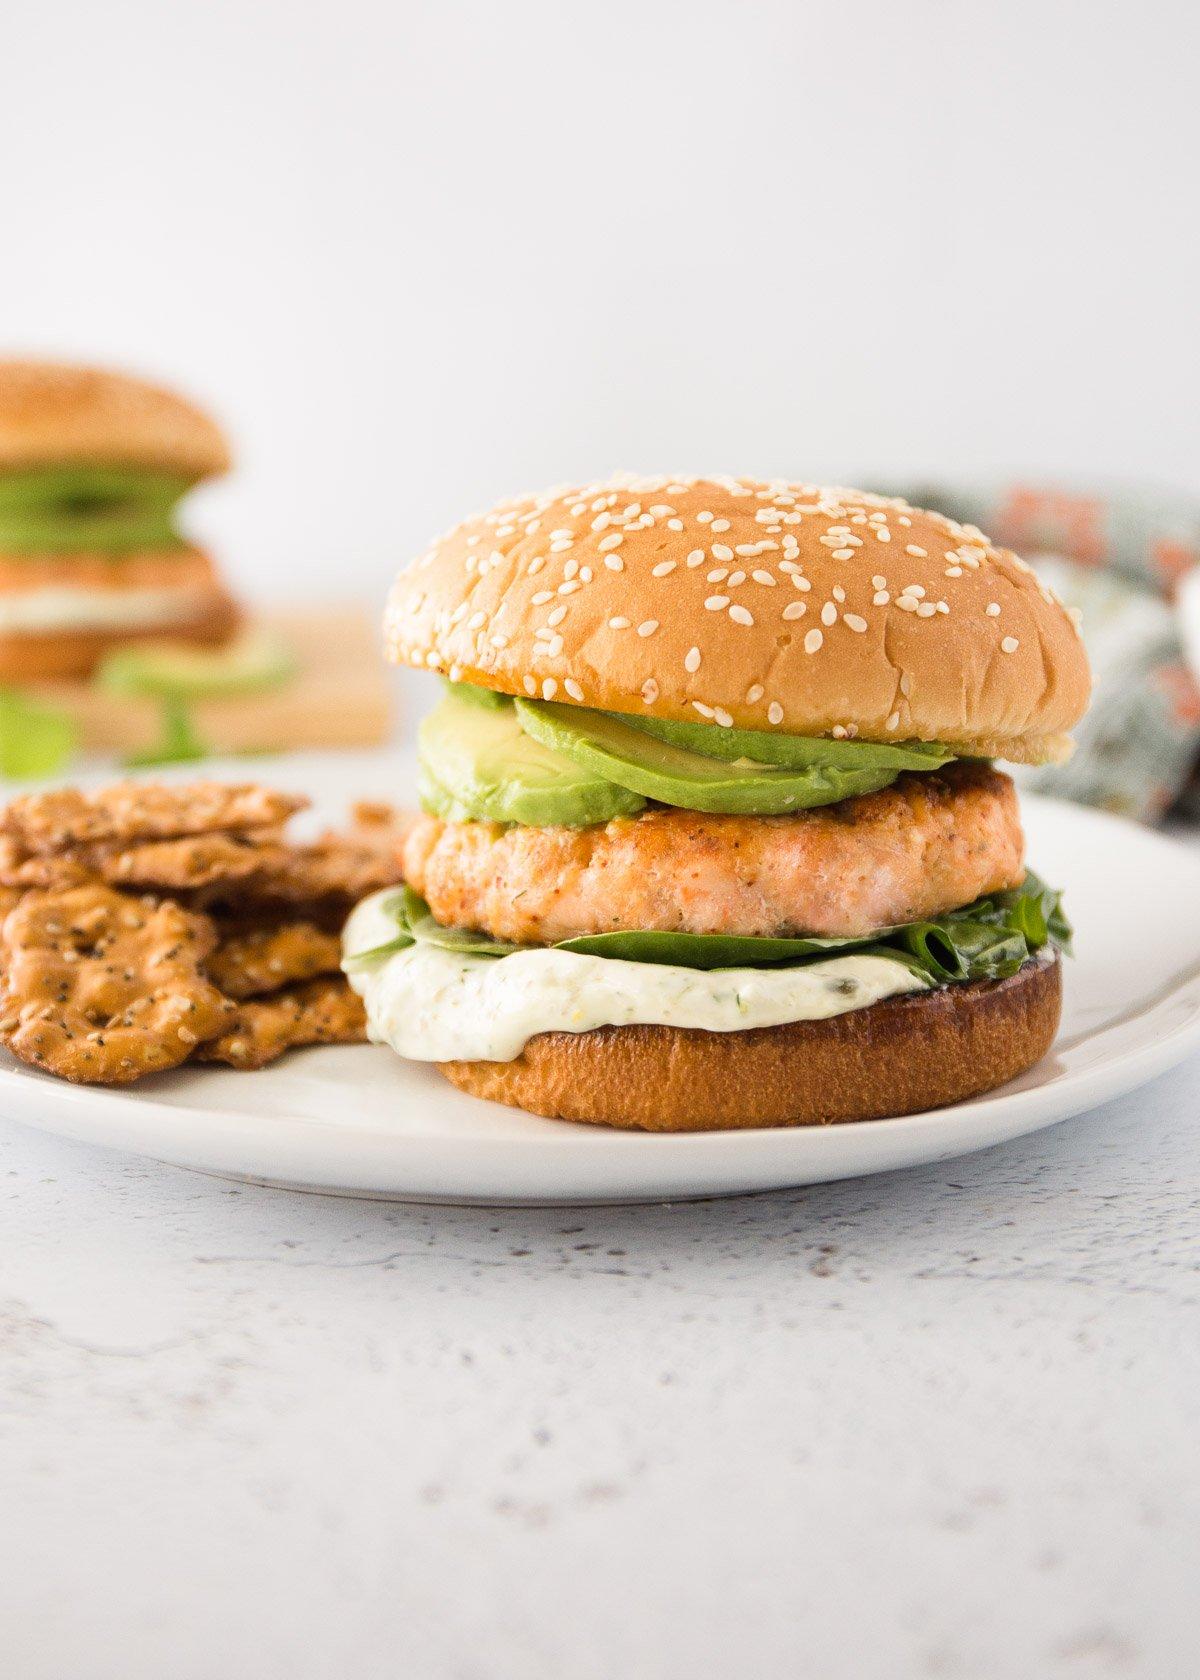 salmon burger on a bun on a white plate